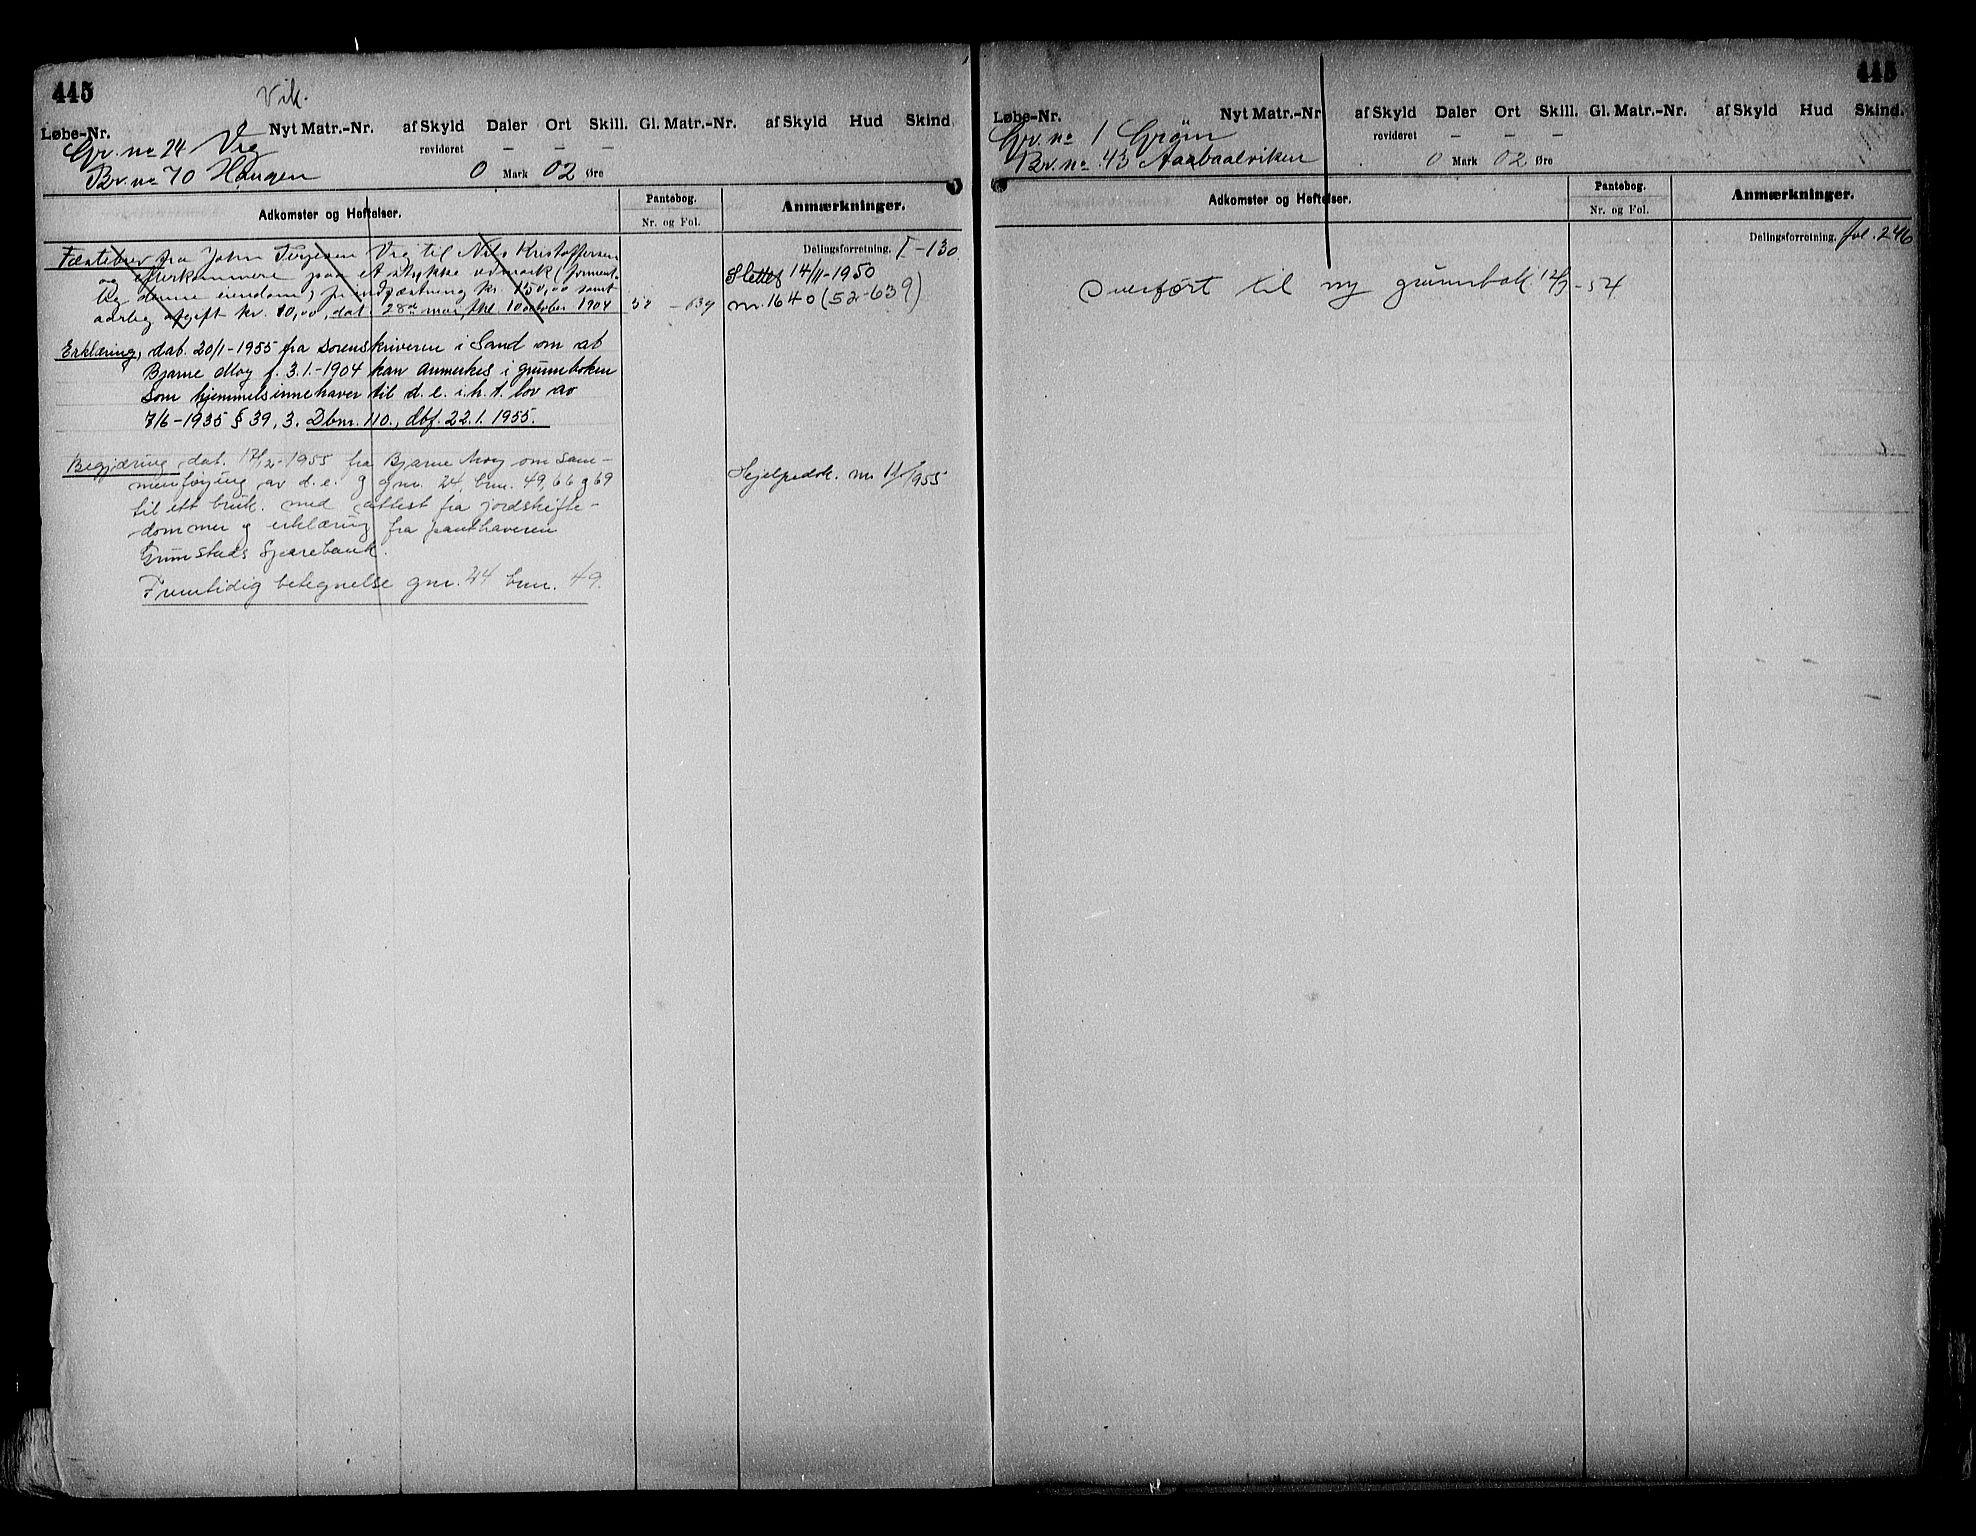 SAK, Vestre Nedenes/Sand sorenskriveri, G/Ga/L0018: Panteregister nr. 13b, 1872-1956, s. 445